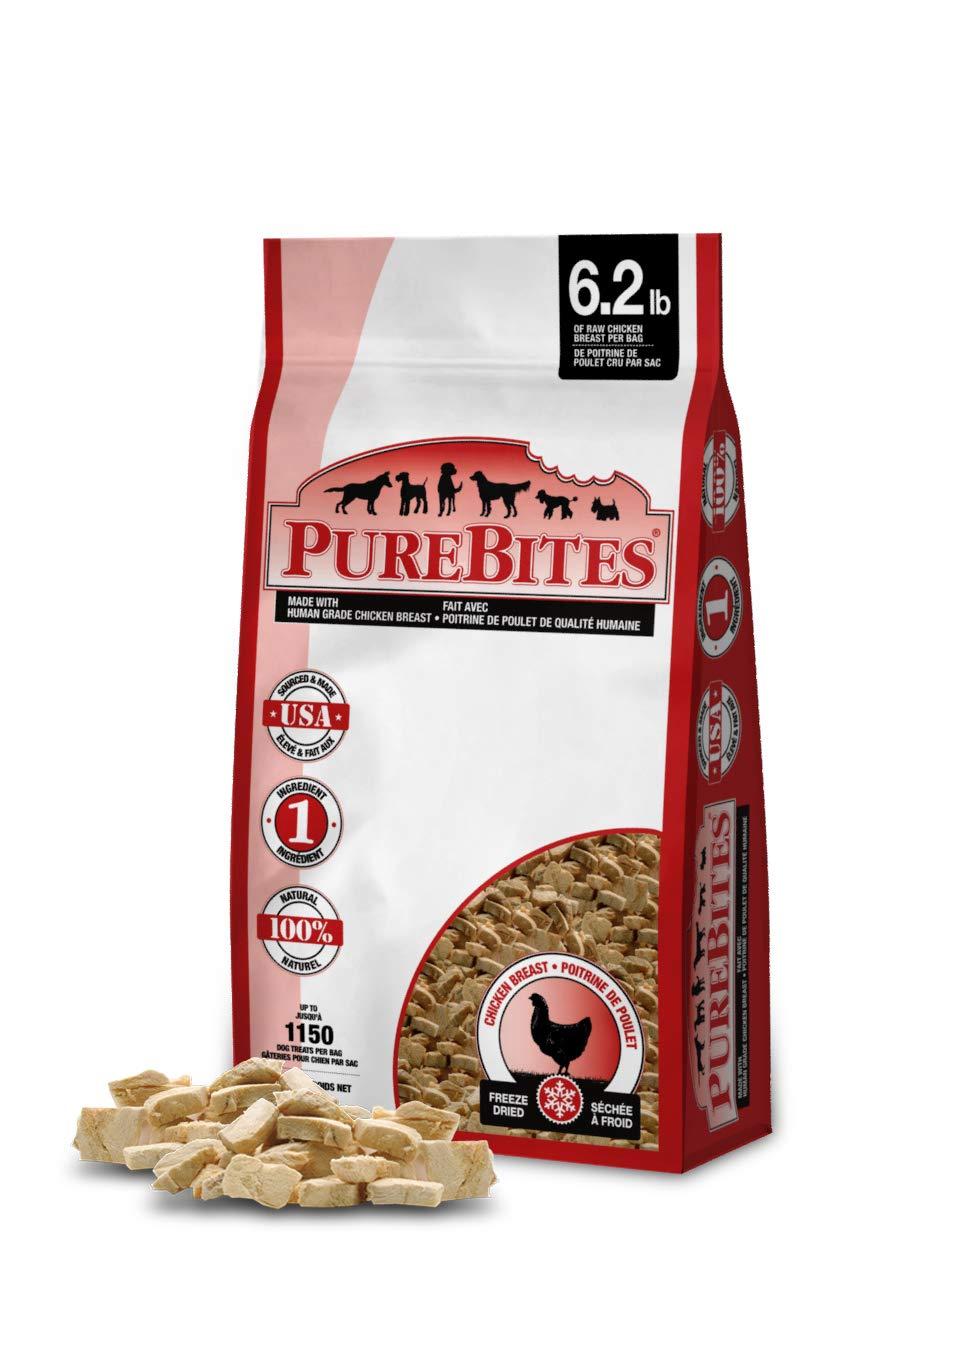 PureBites Chicken Breast 28.0oz/ 794g - Jumbo Size